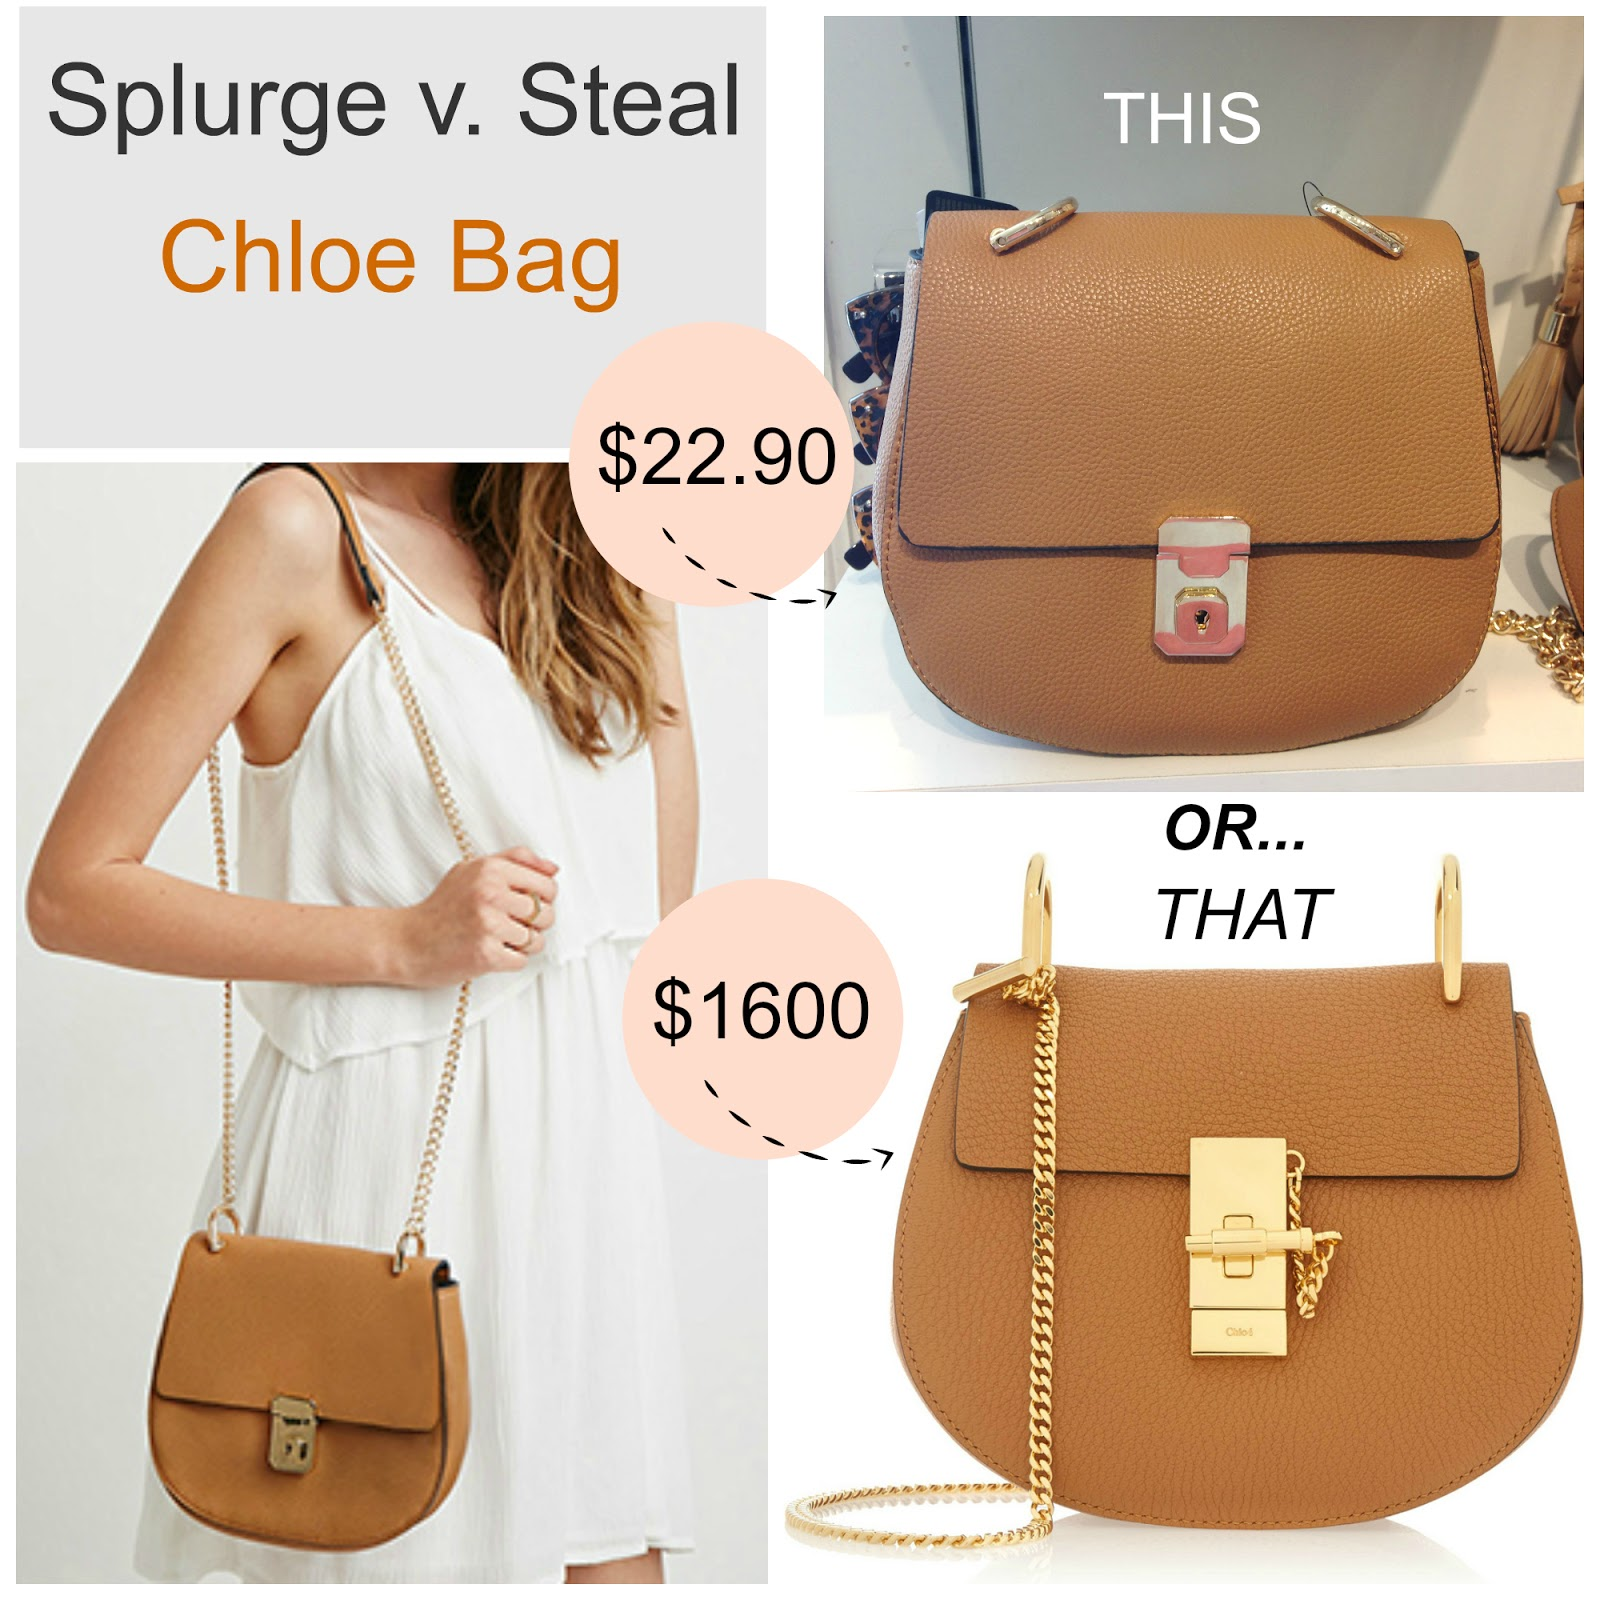 cloe purses - Tracy's Notebook of Style: Splurge v. Steal: Chlo�� bag $22.90 v ...